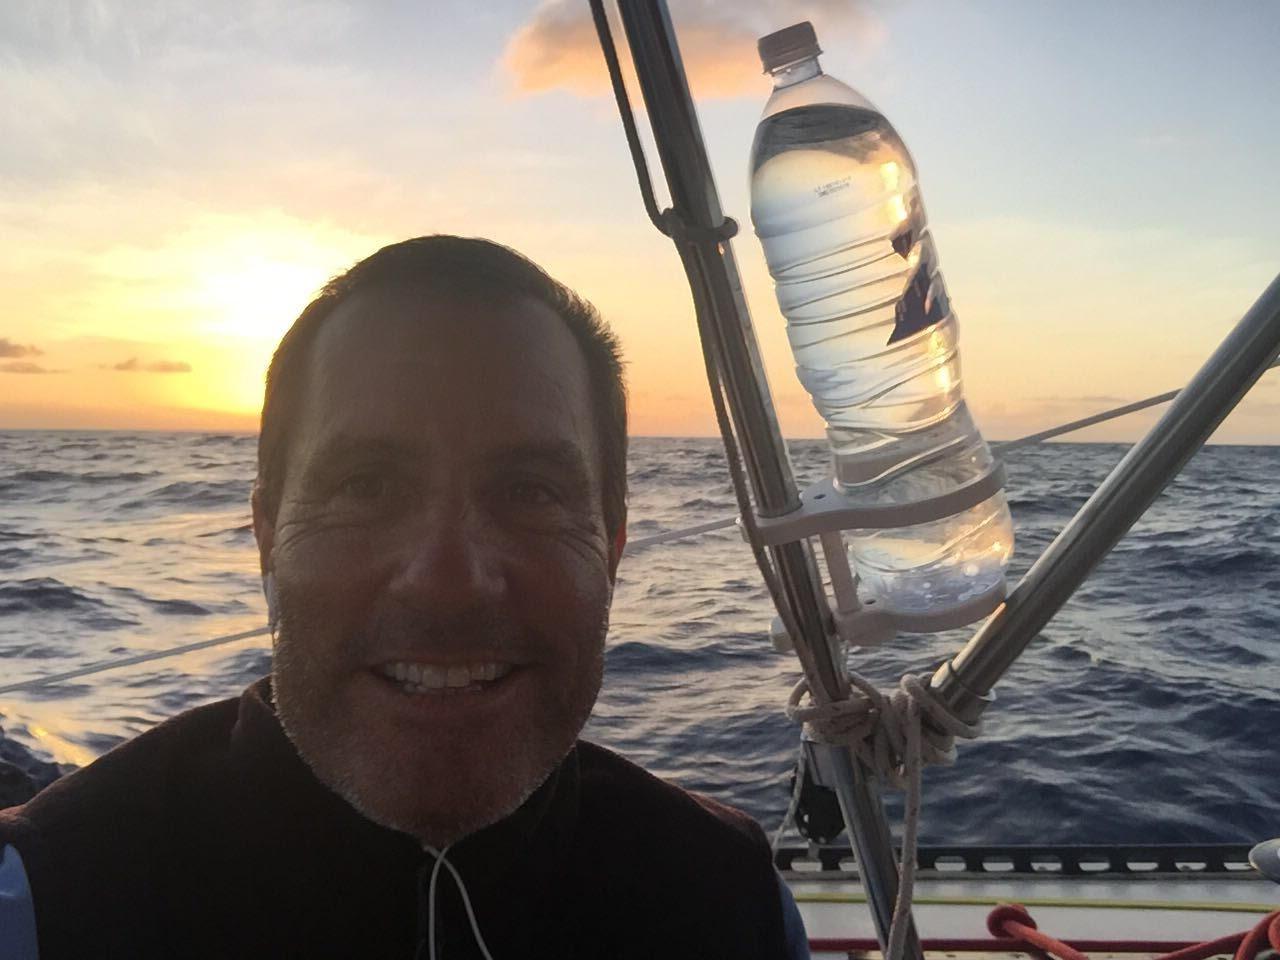 Sunset selfie @ Sea!